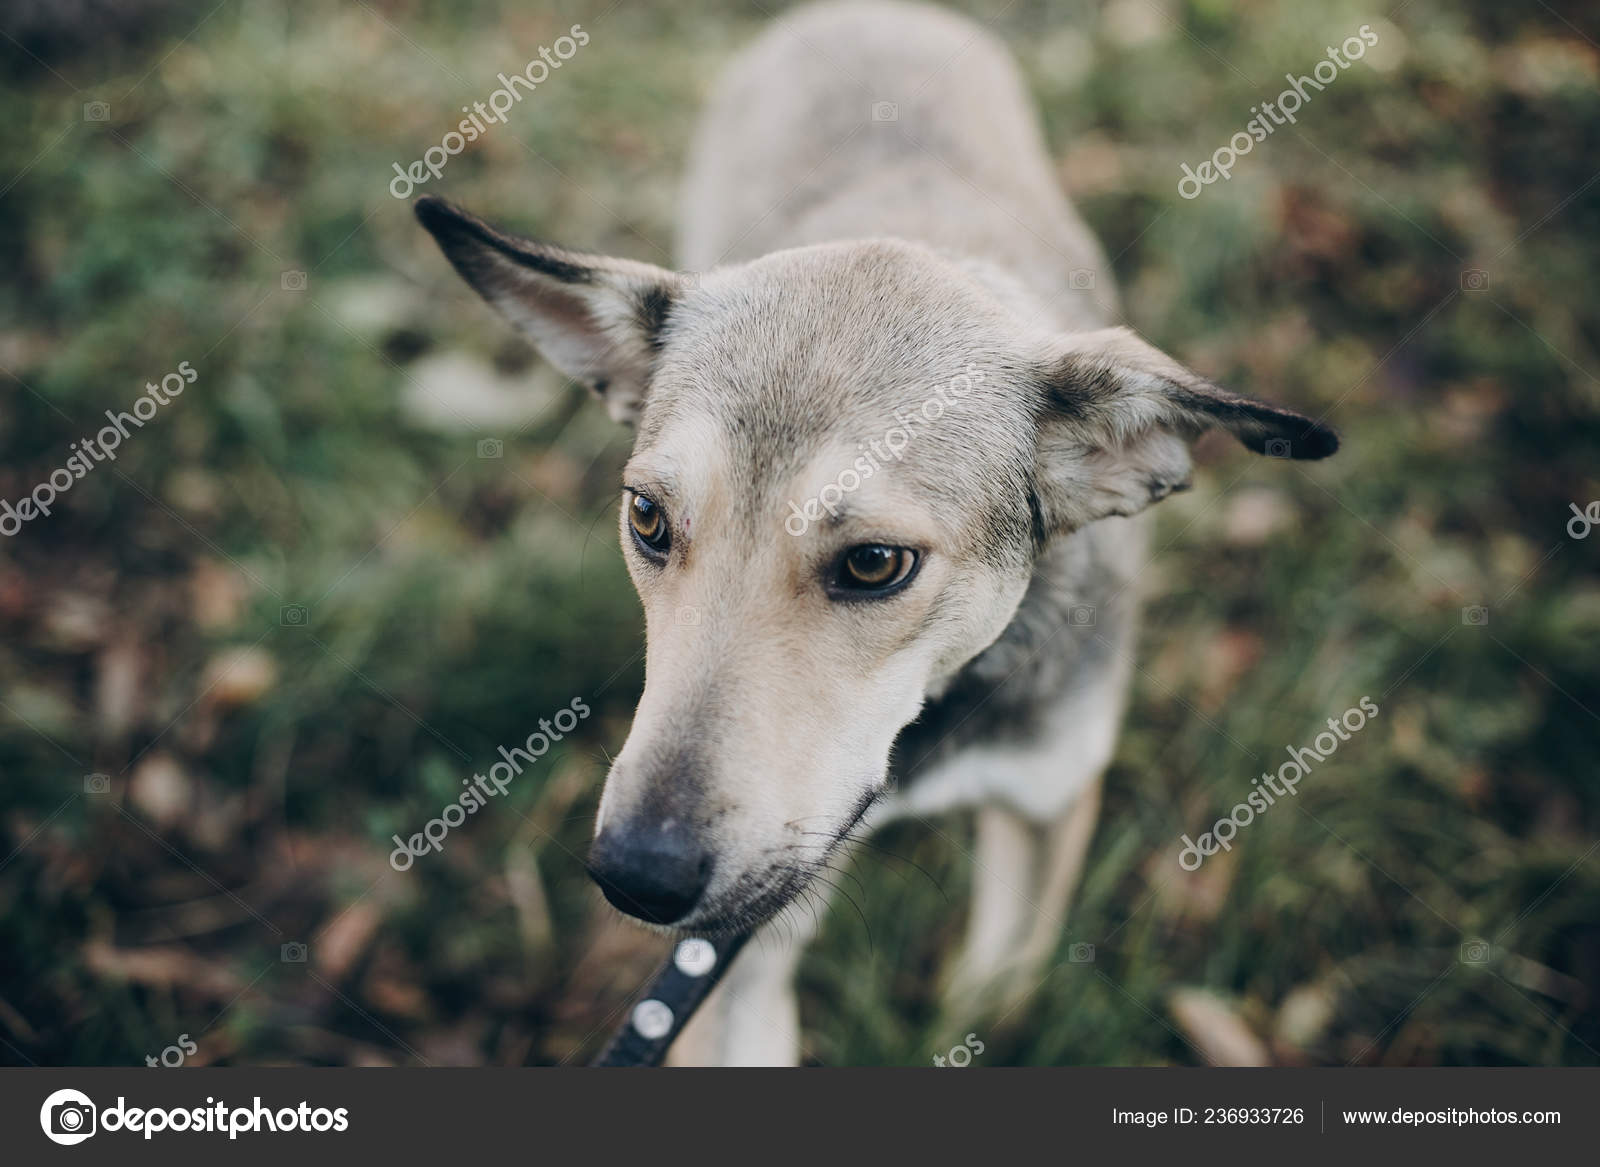 Scared Stray Dog Sad Eyes Emotions Walking City Street